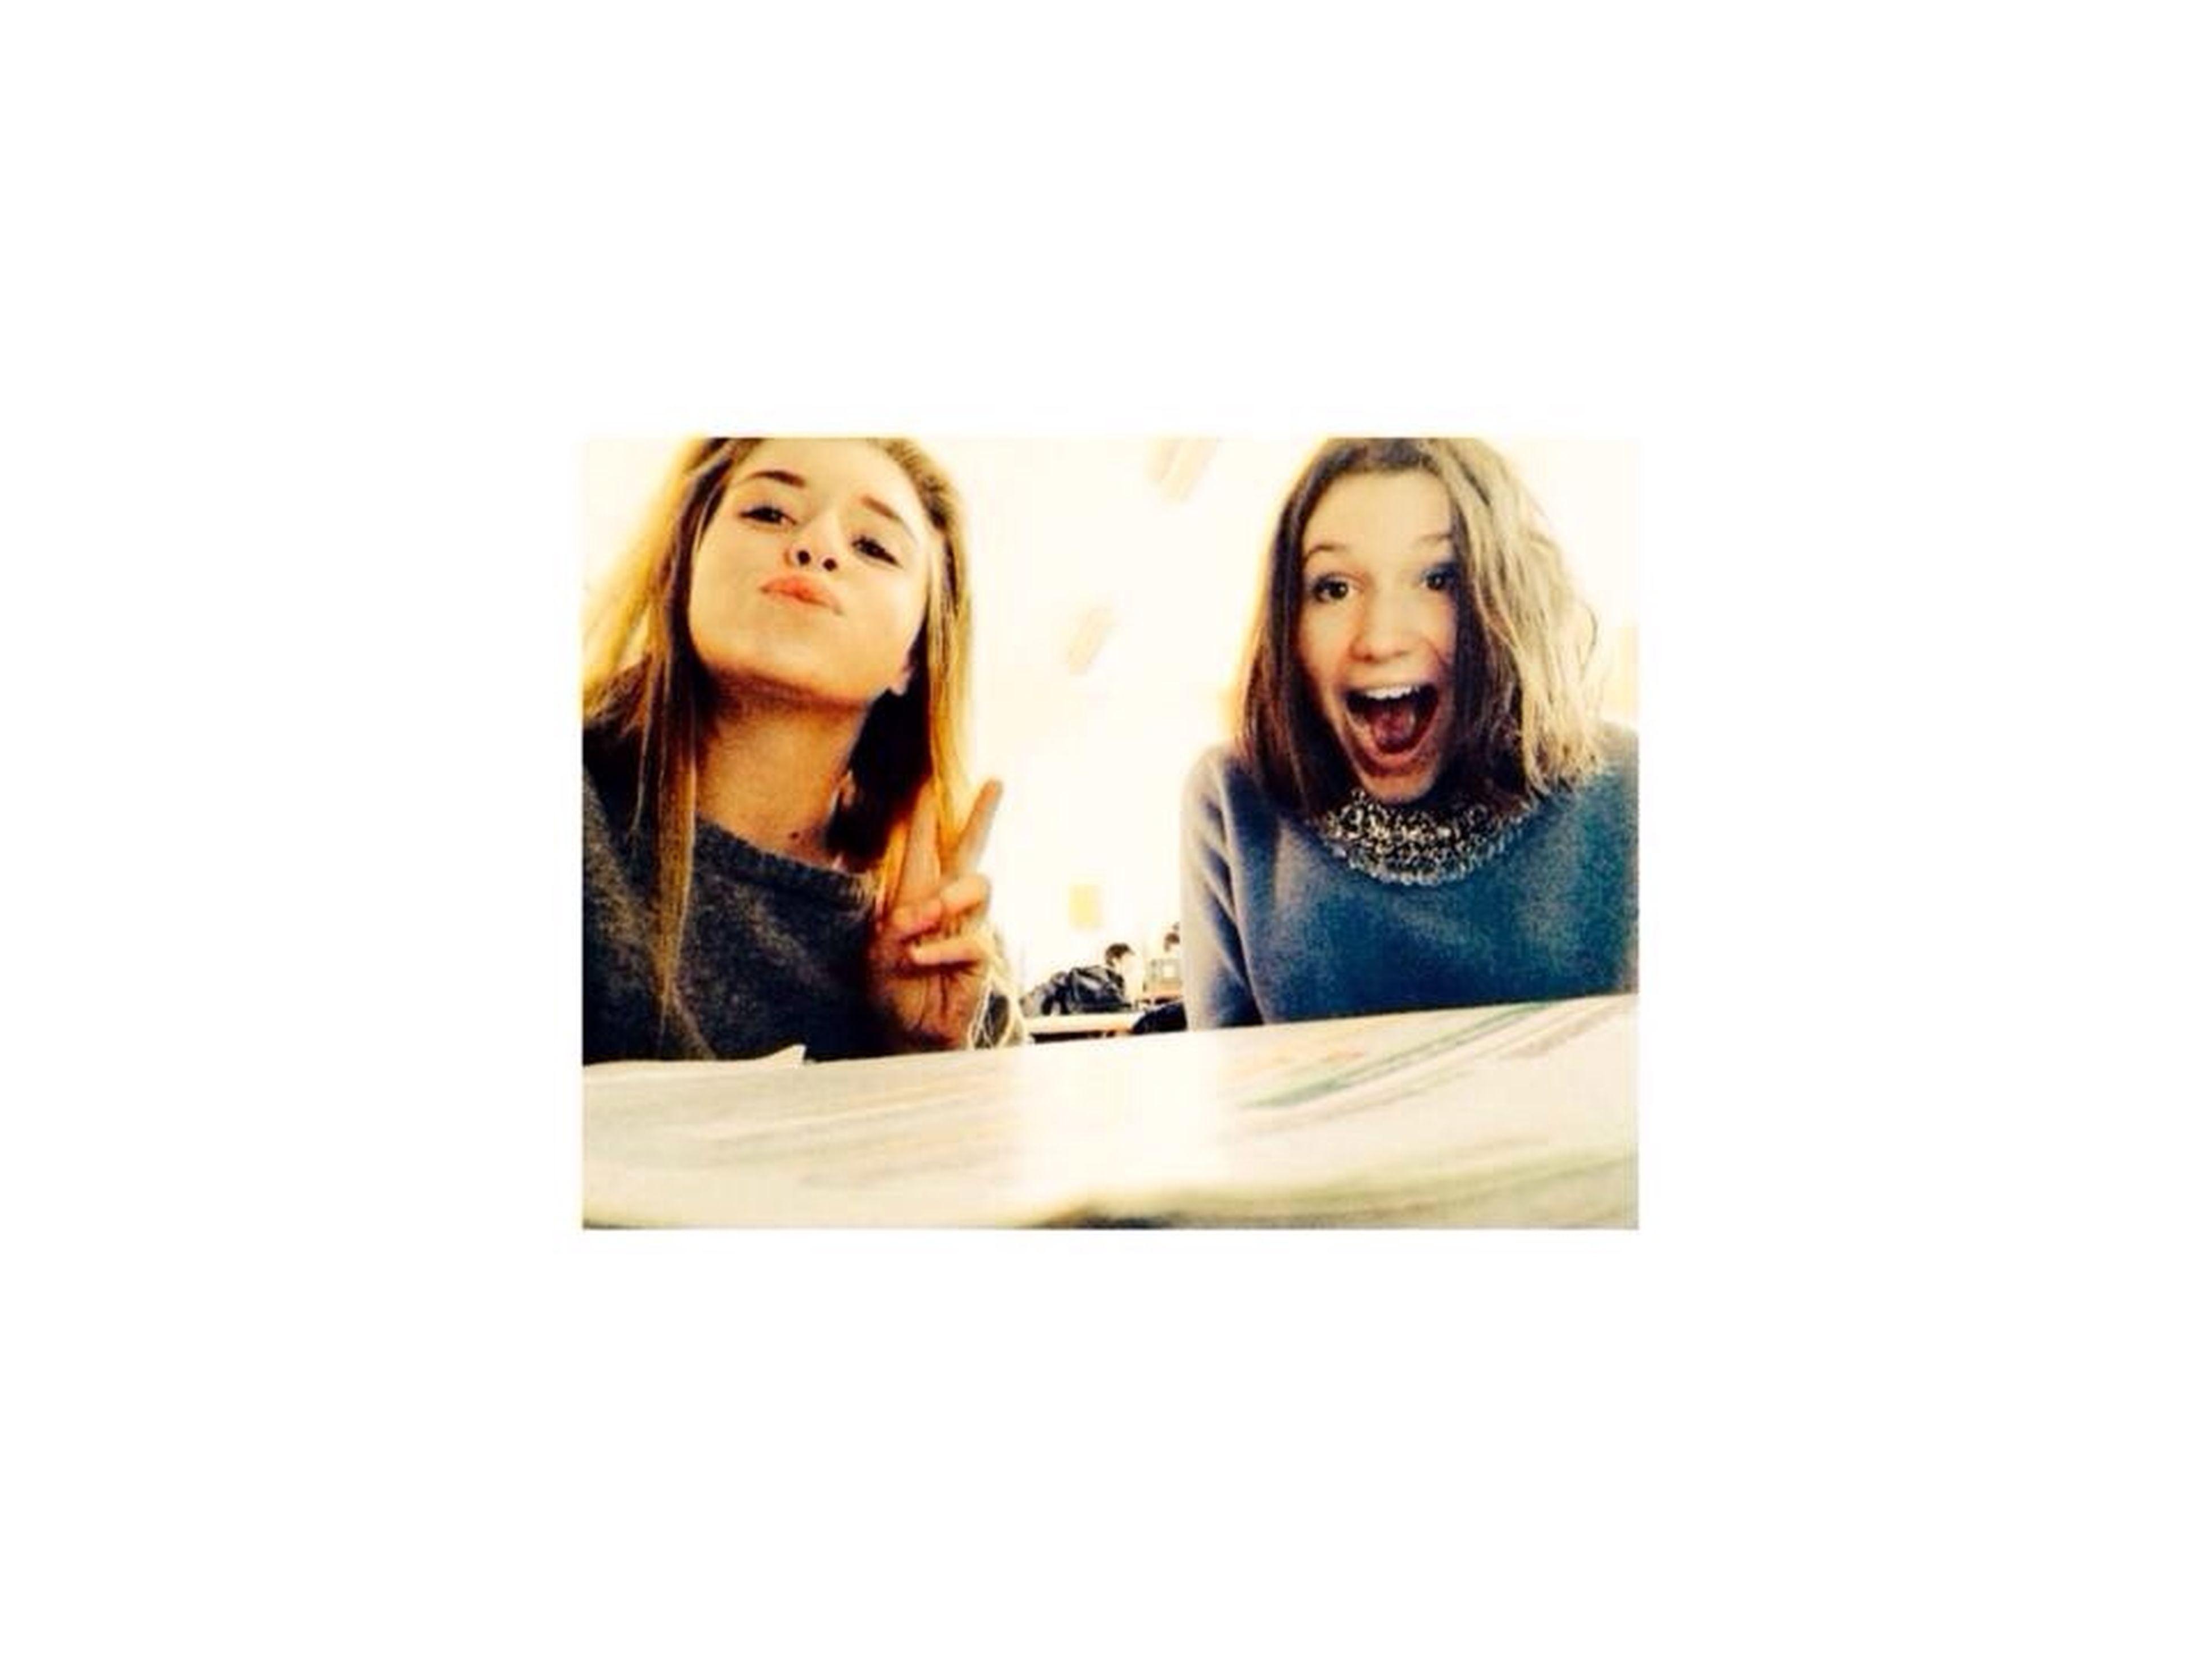 ??❤️ Friends Love Taking Photos Selfie Smile Funny Having Fun Good Times School Enjoying Life